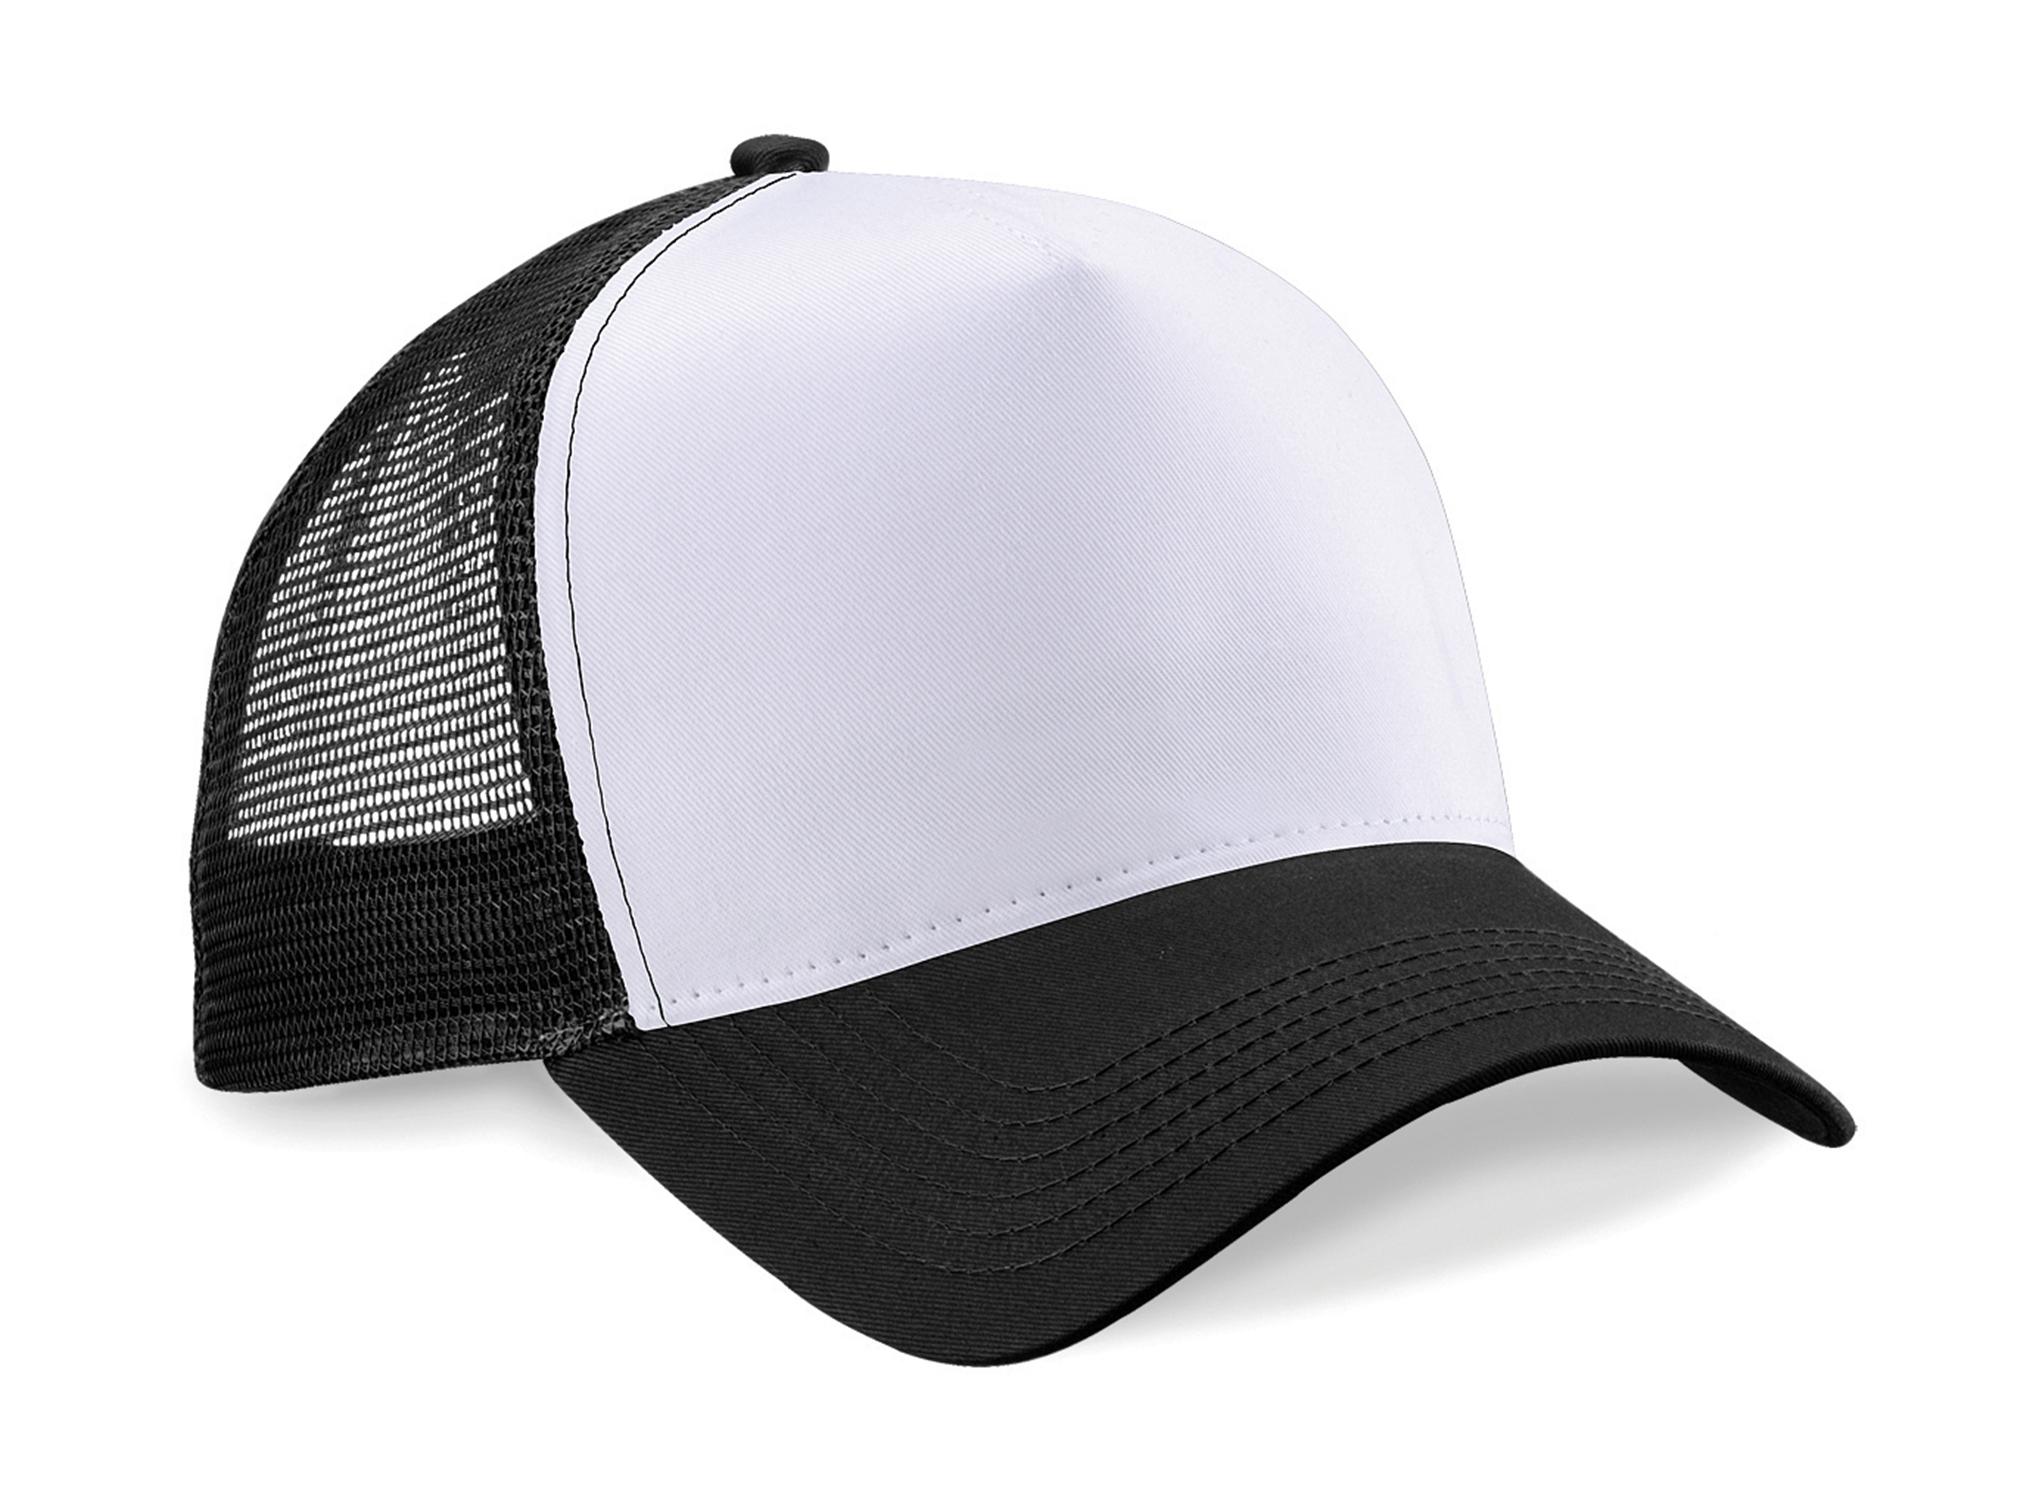 VINTAGE SNAPBACK TRUCKER CAP